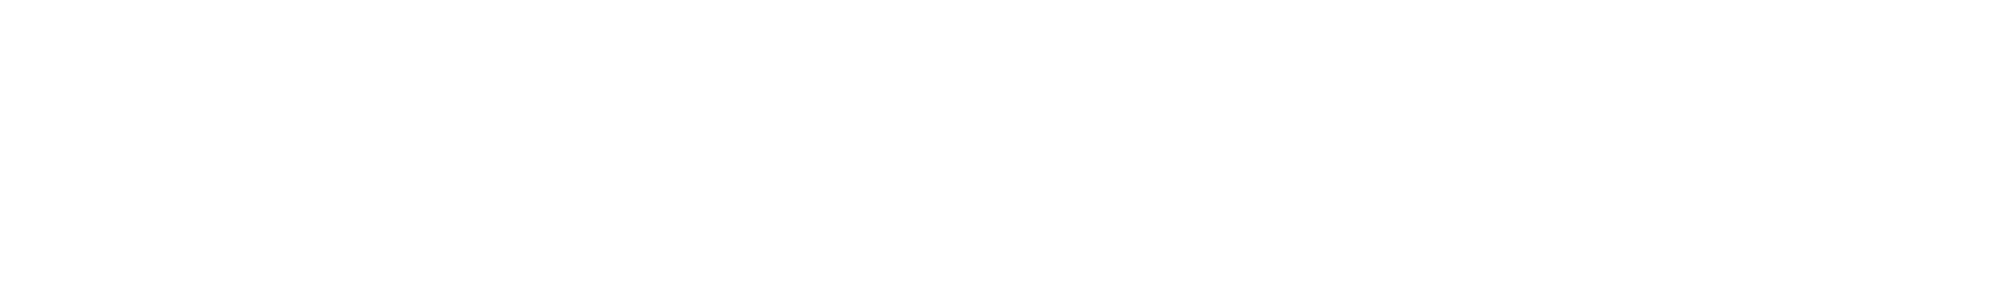 BODYPIXEL ボディピクセル 公式サイト